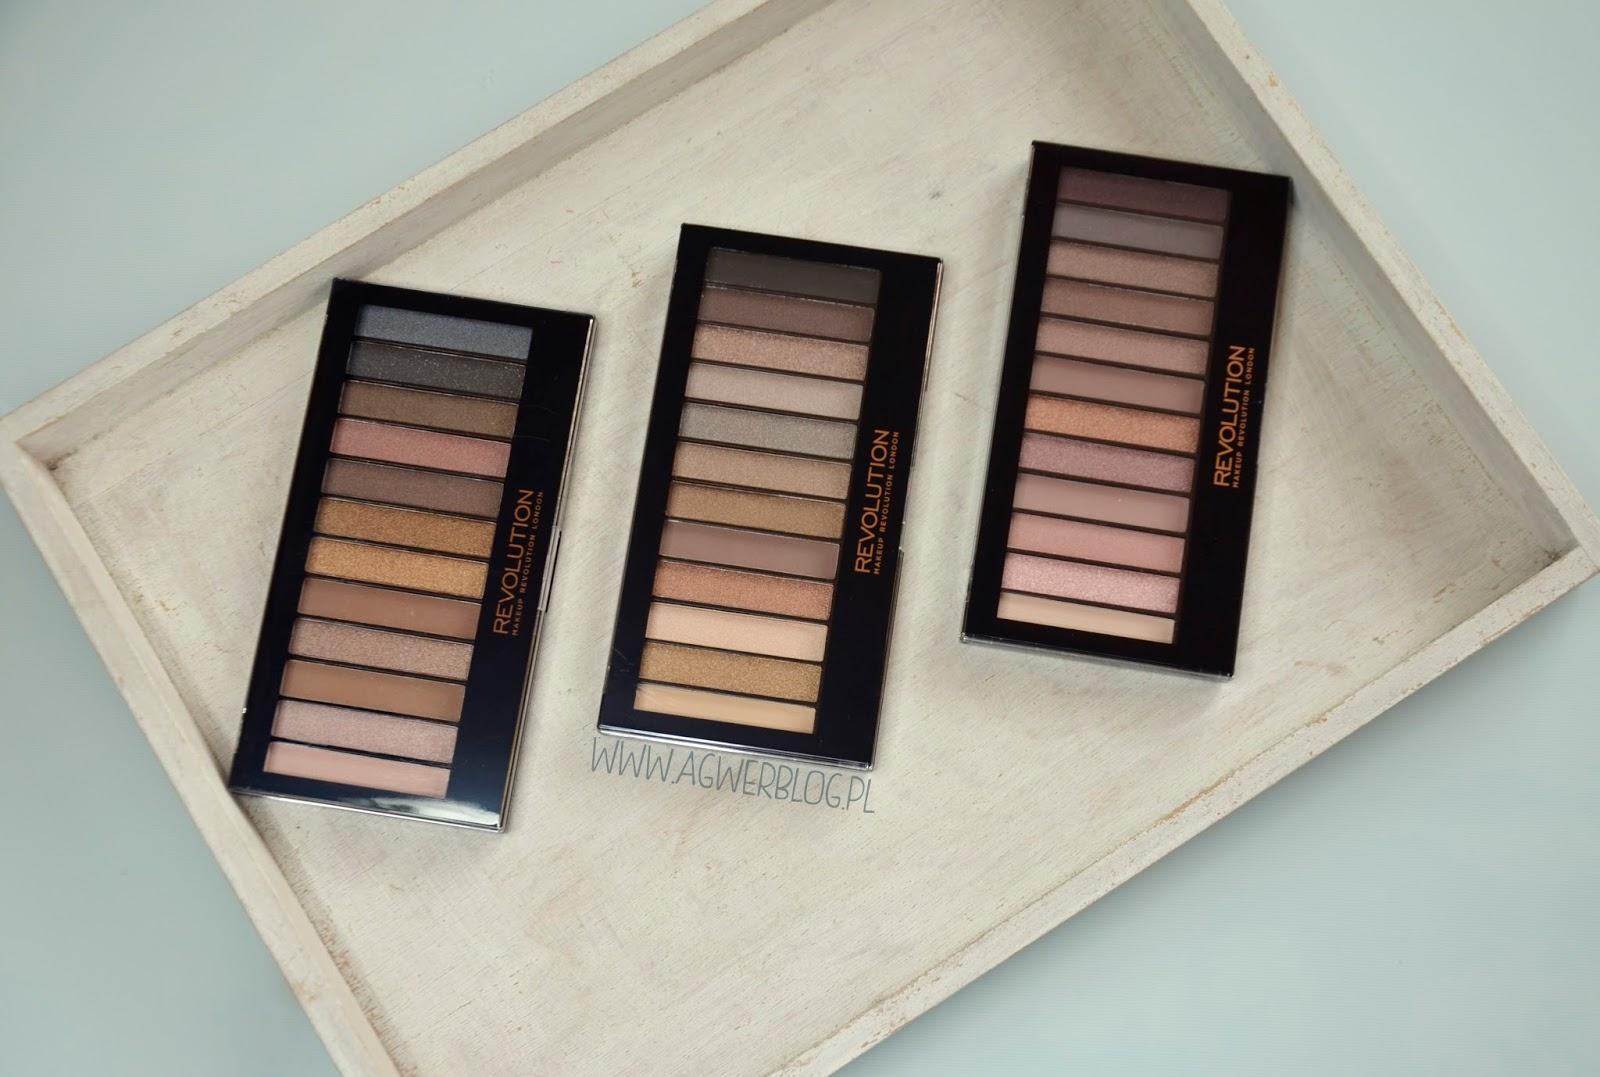 Palety Iconic od Makeup Revolution: która najlepsza?